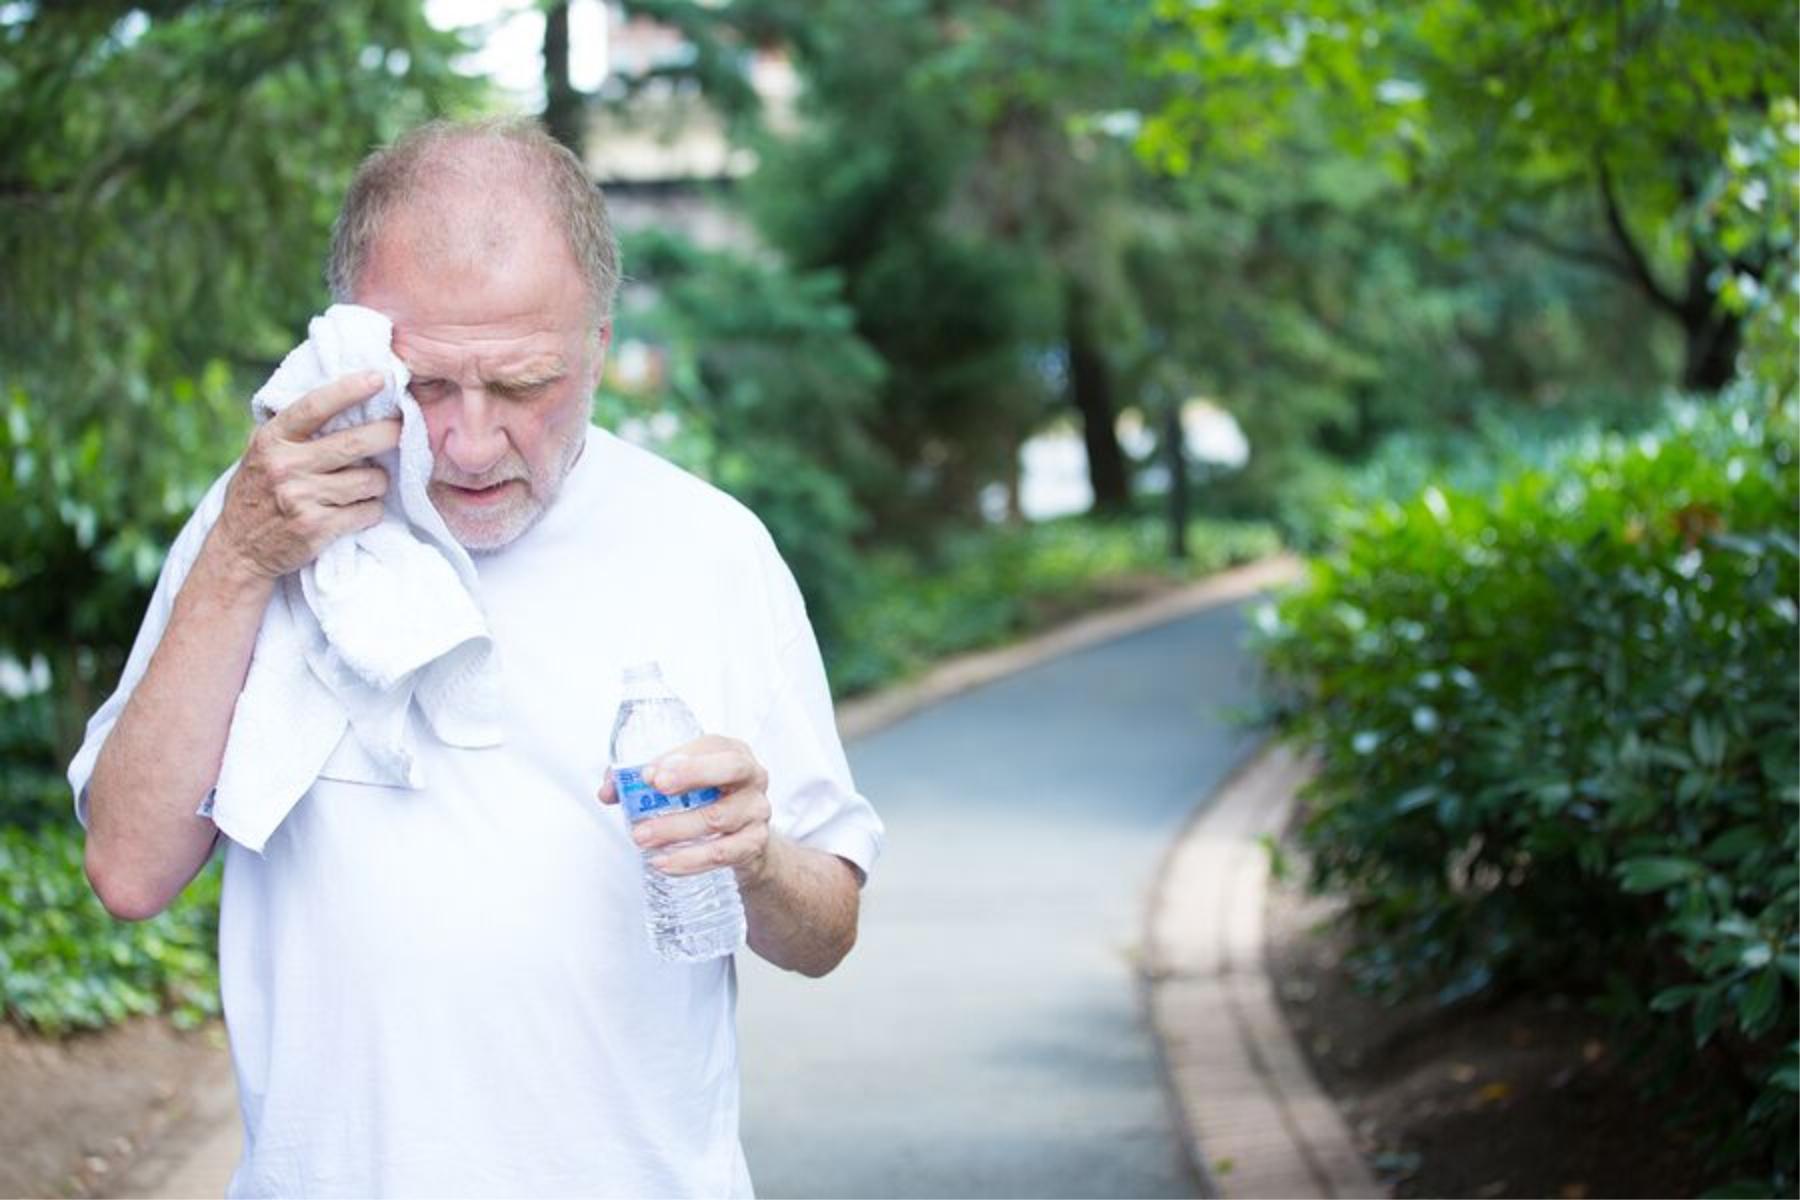 Home Health Care in Auburn CA: Senior Health: Overheating